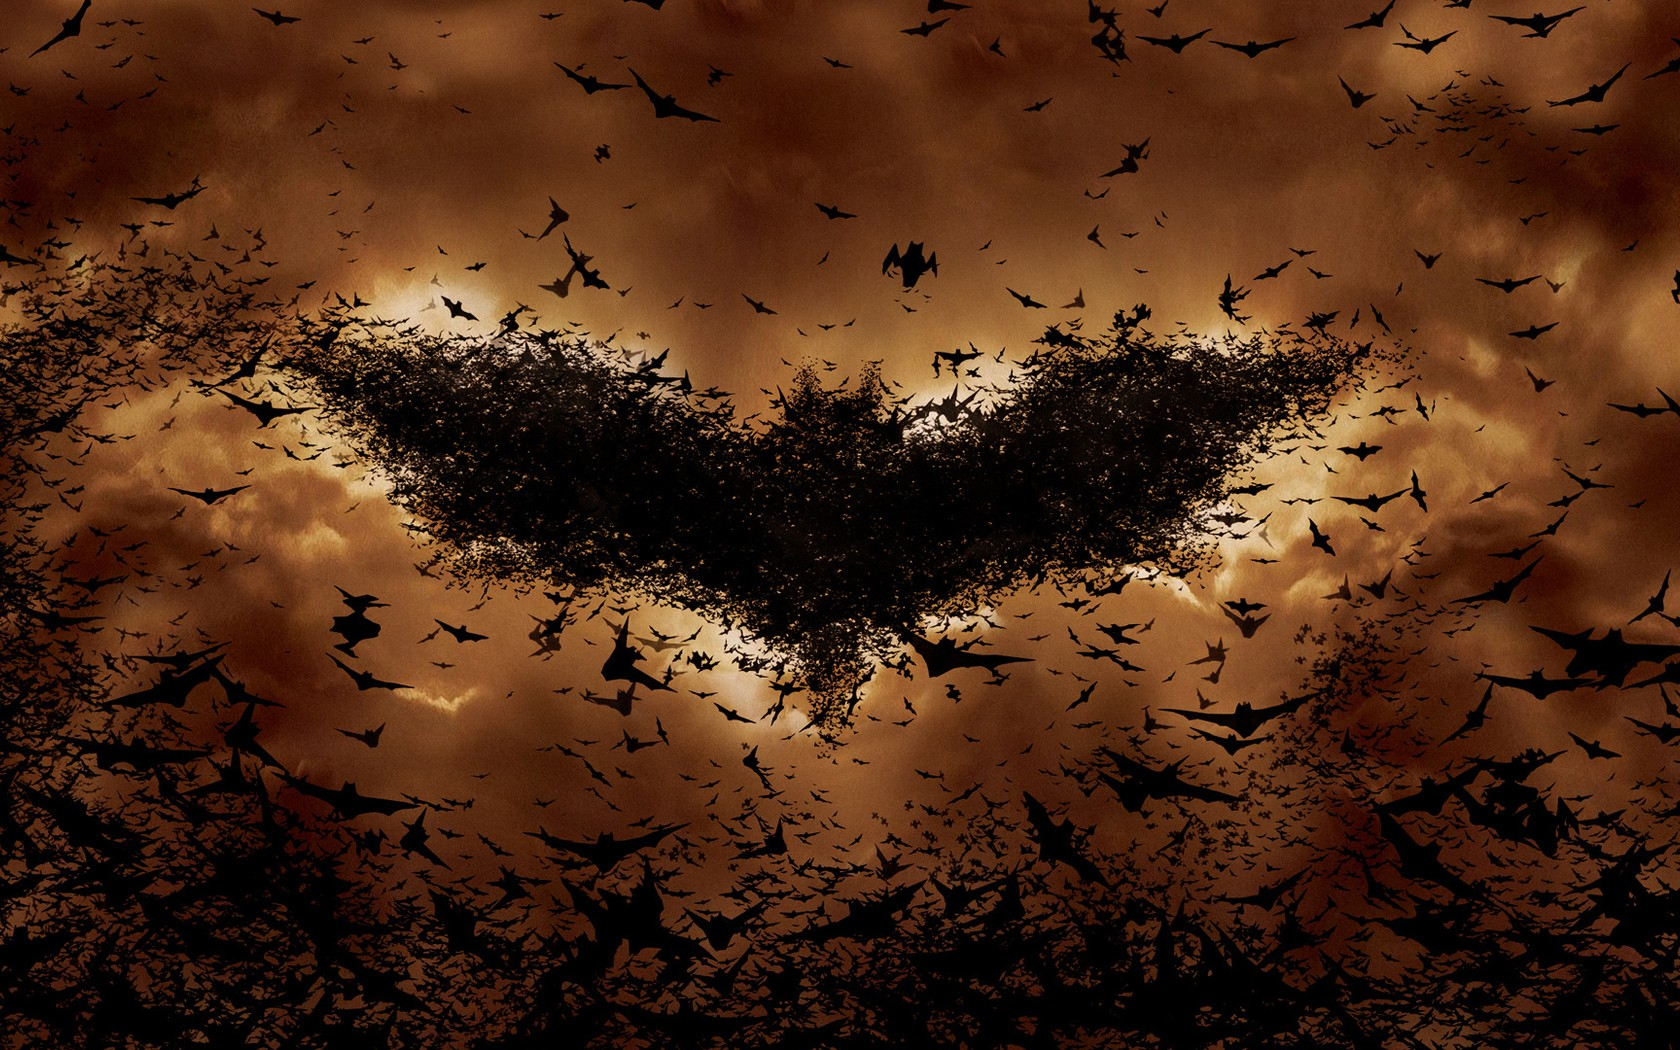 Batman Movies Wallpaper 1680x1050 Batman Movies Logos 1680x1050